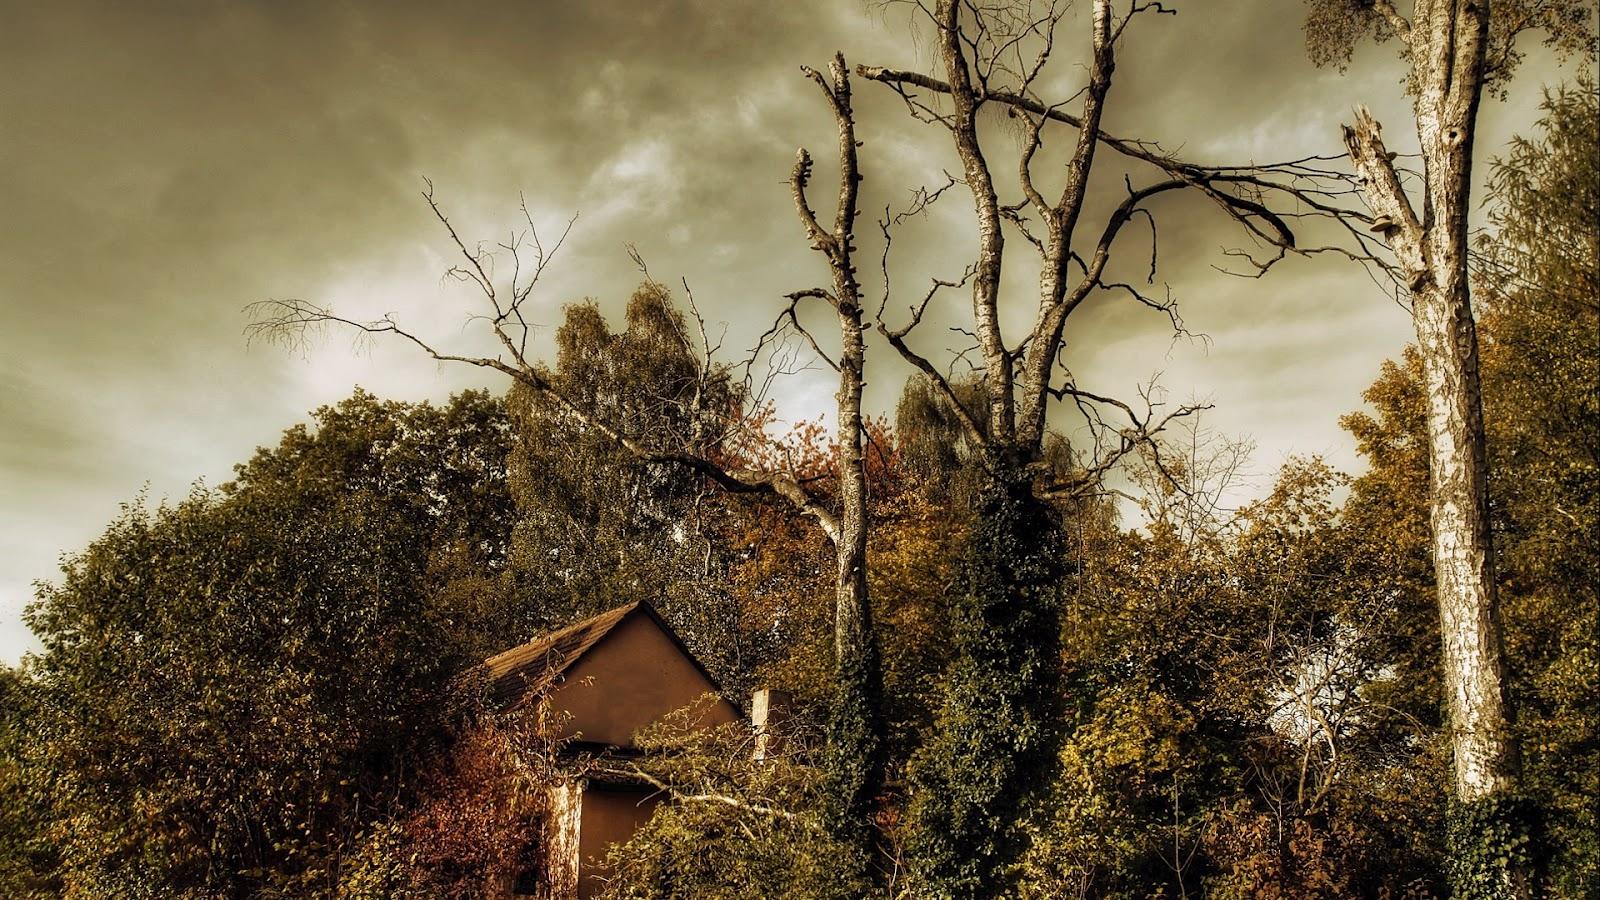 http://3.bp.blogspot.com/-m_PLBULhzl8/T4DbFhCJ0sI/AAAAAAAAmsE/_47-YFdqM78/s1600/Nature+HD+Wallpaper++(597).jpg